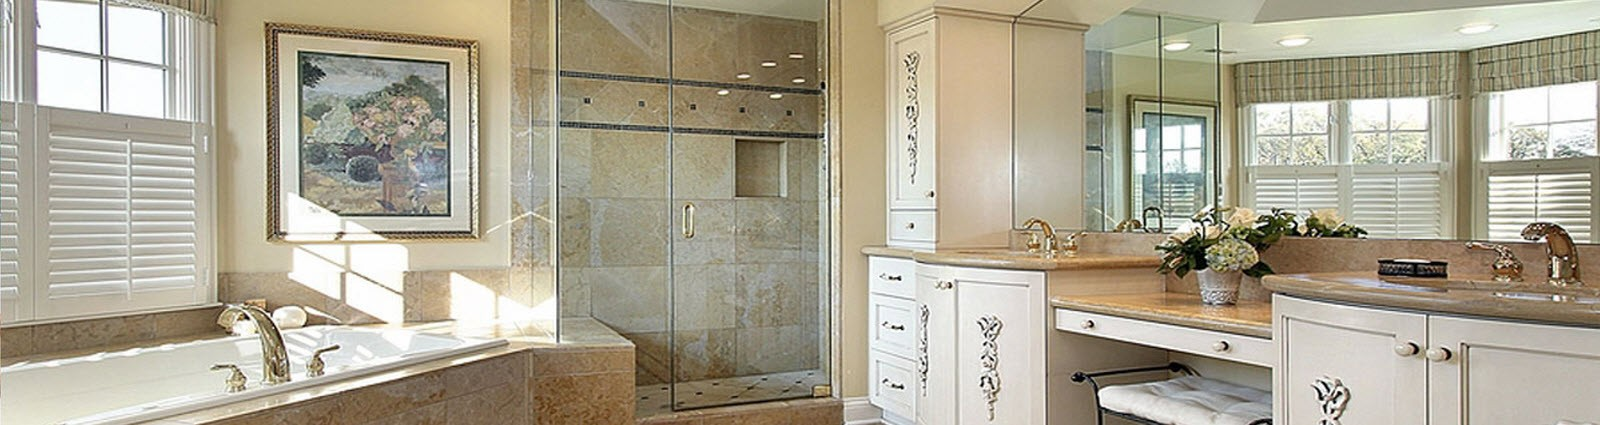 Rohan Glass Company Glass Mirror Services In San Fernando Valley - Bathroom vanities san fernando valley